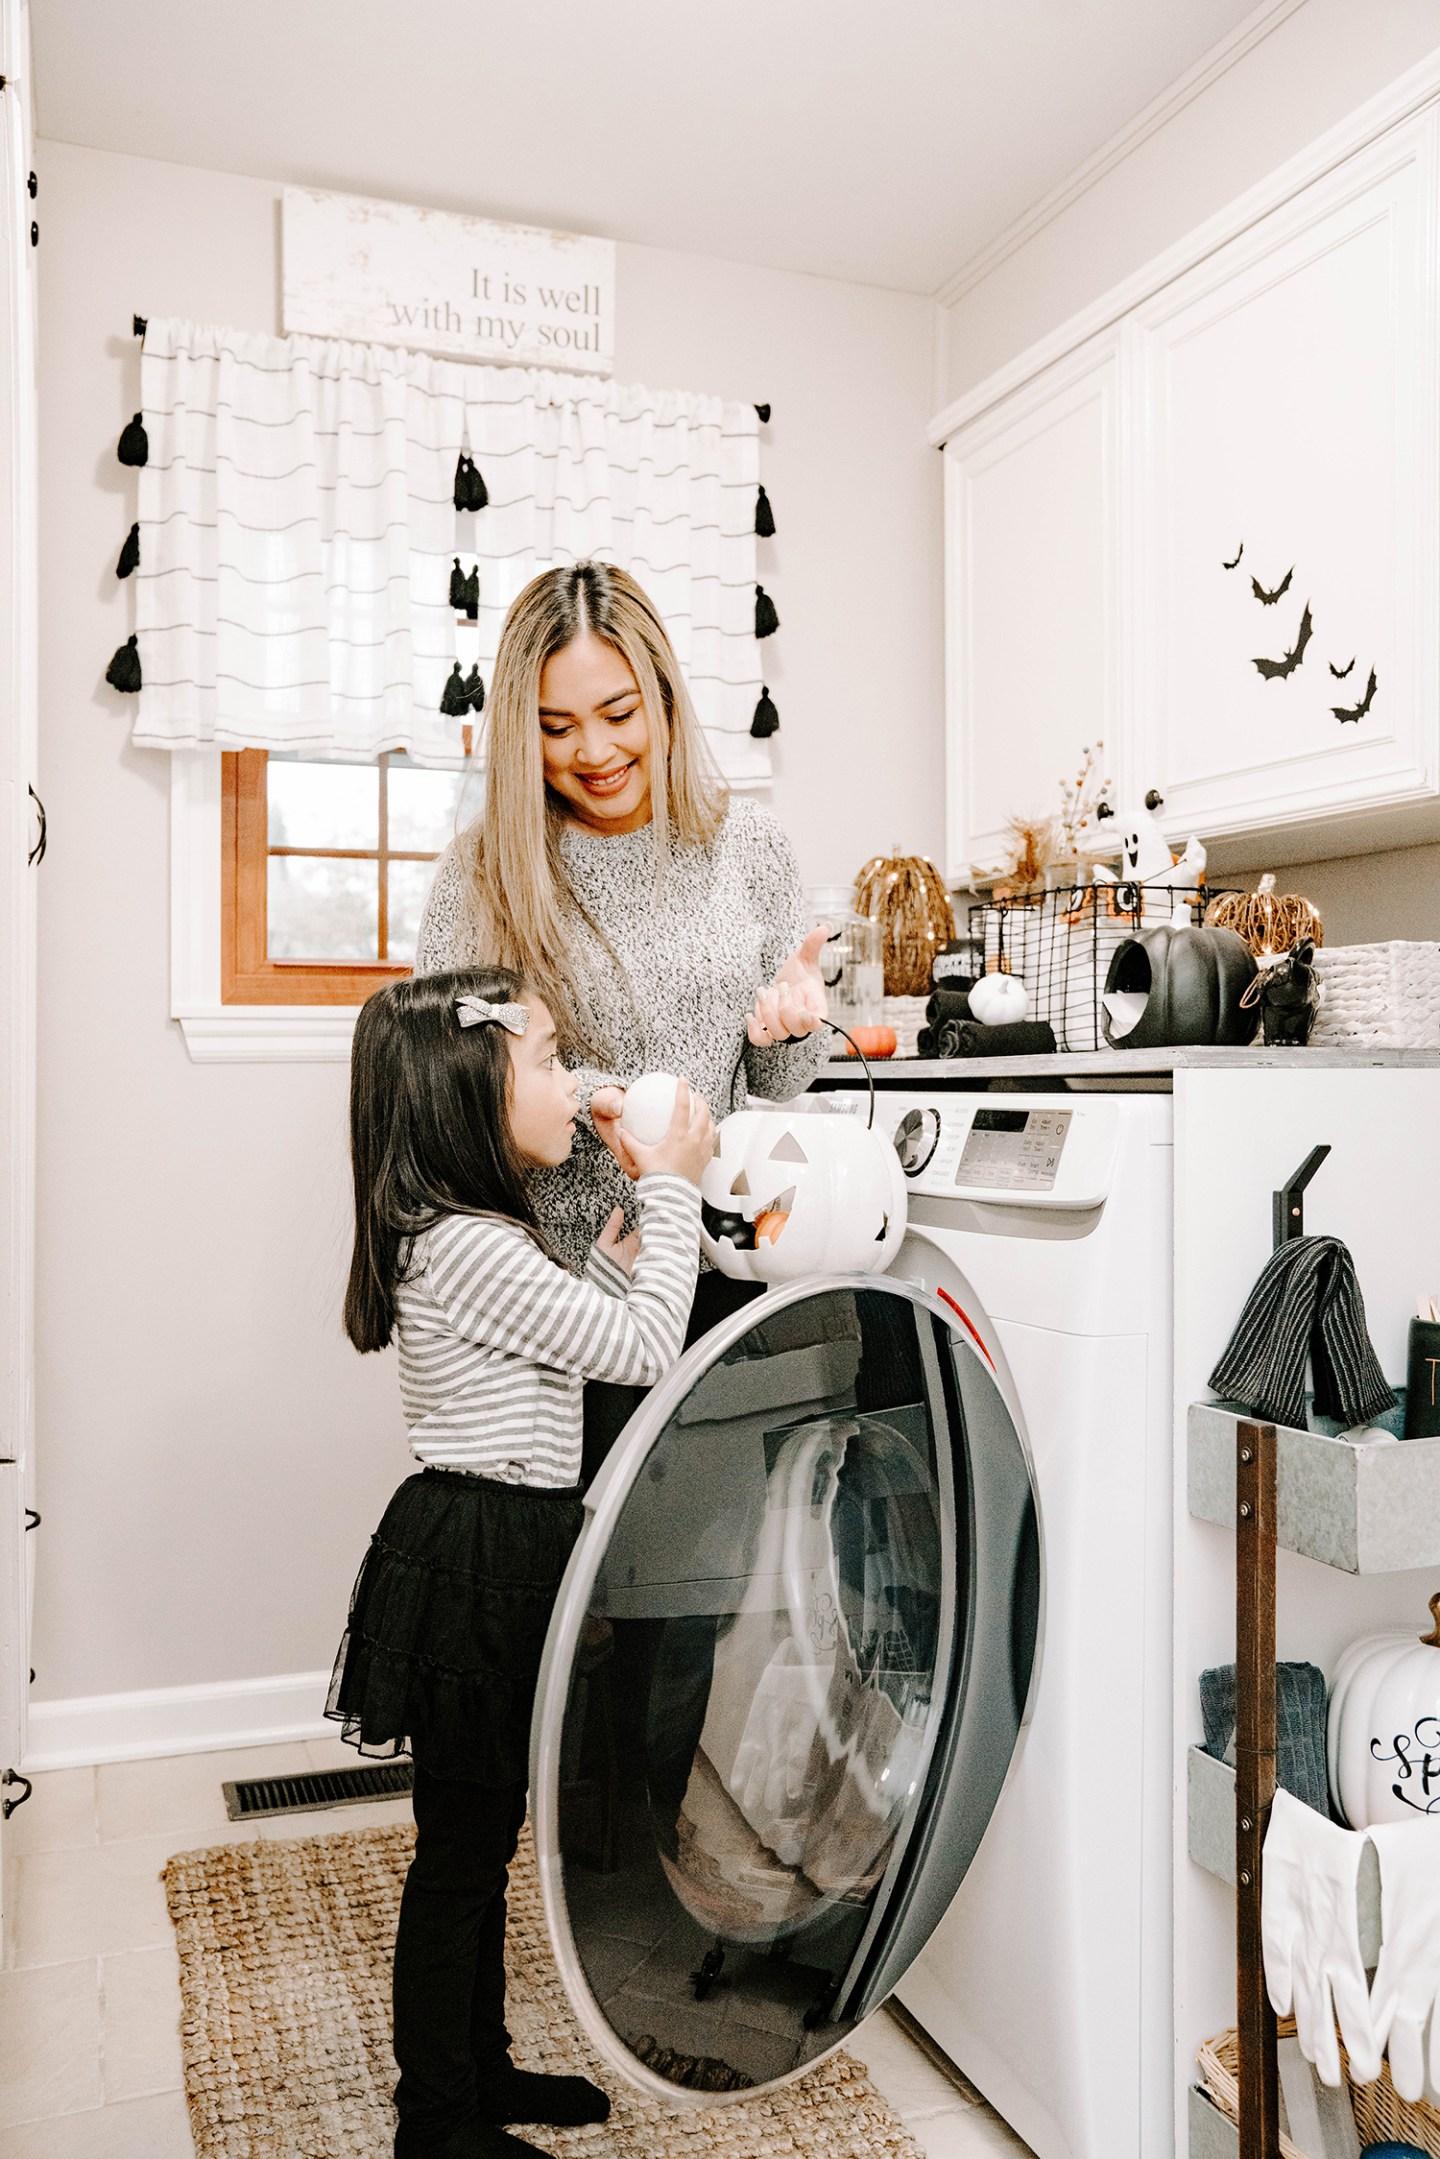 halloween decor ideas for laundry room